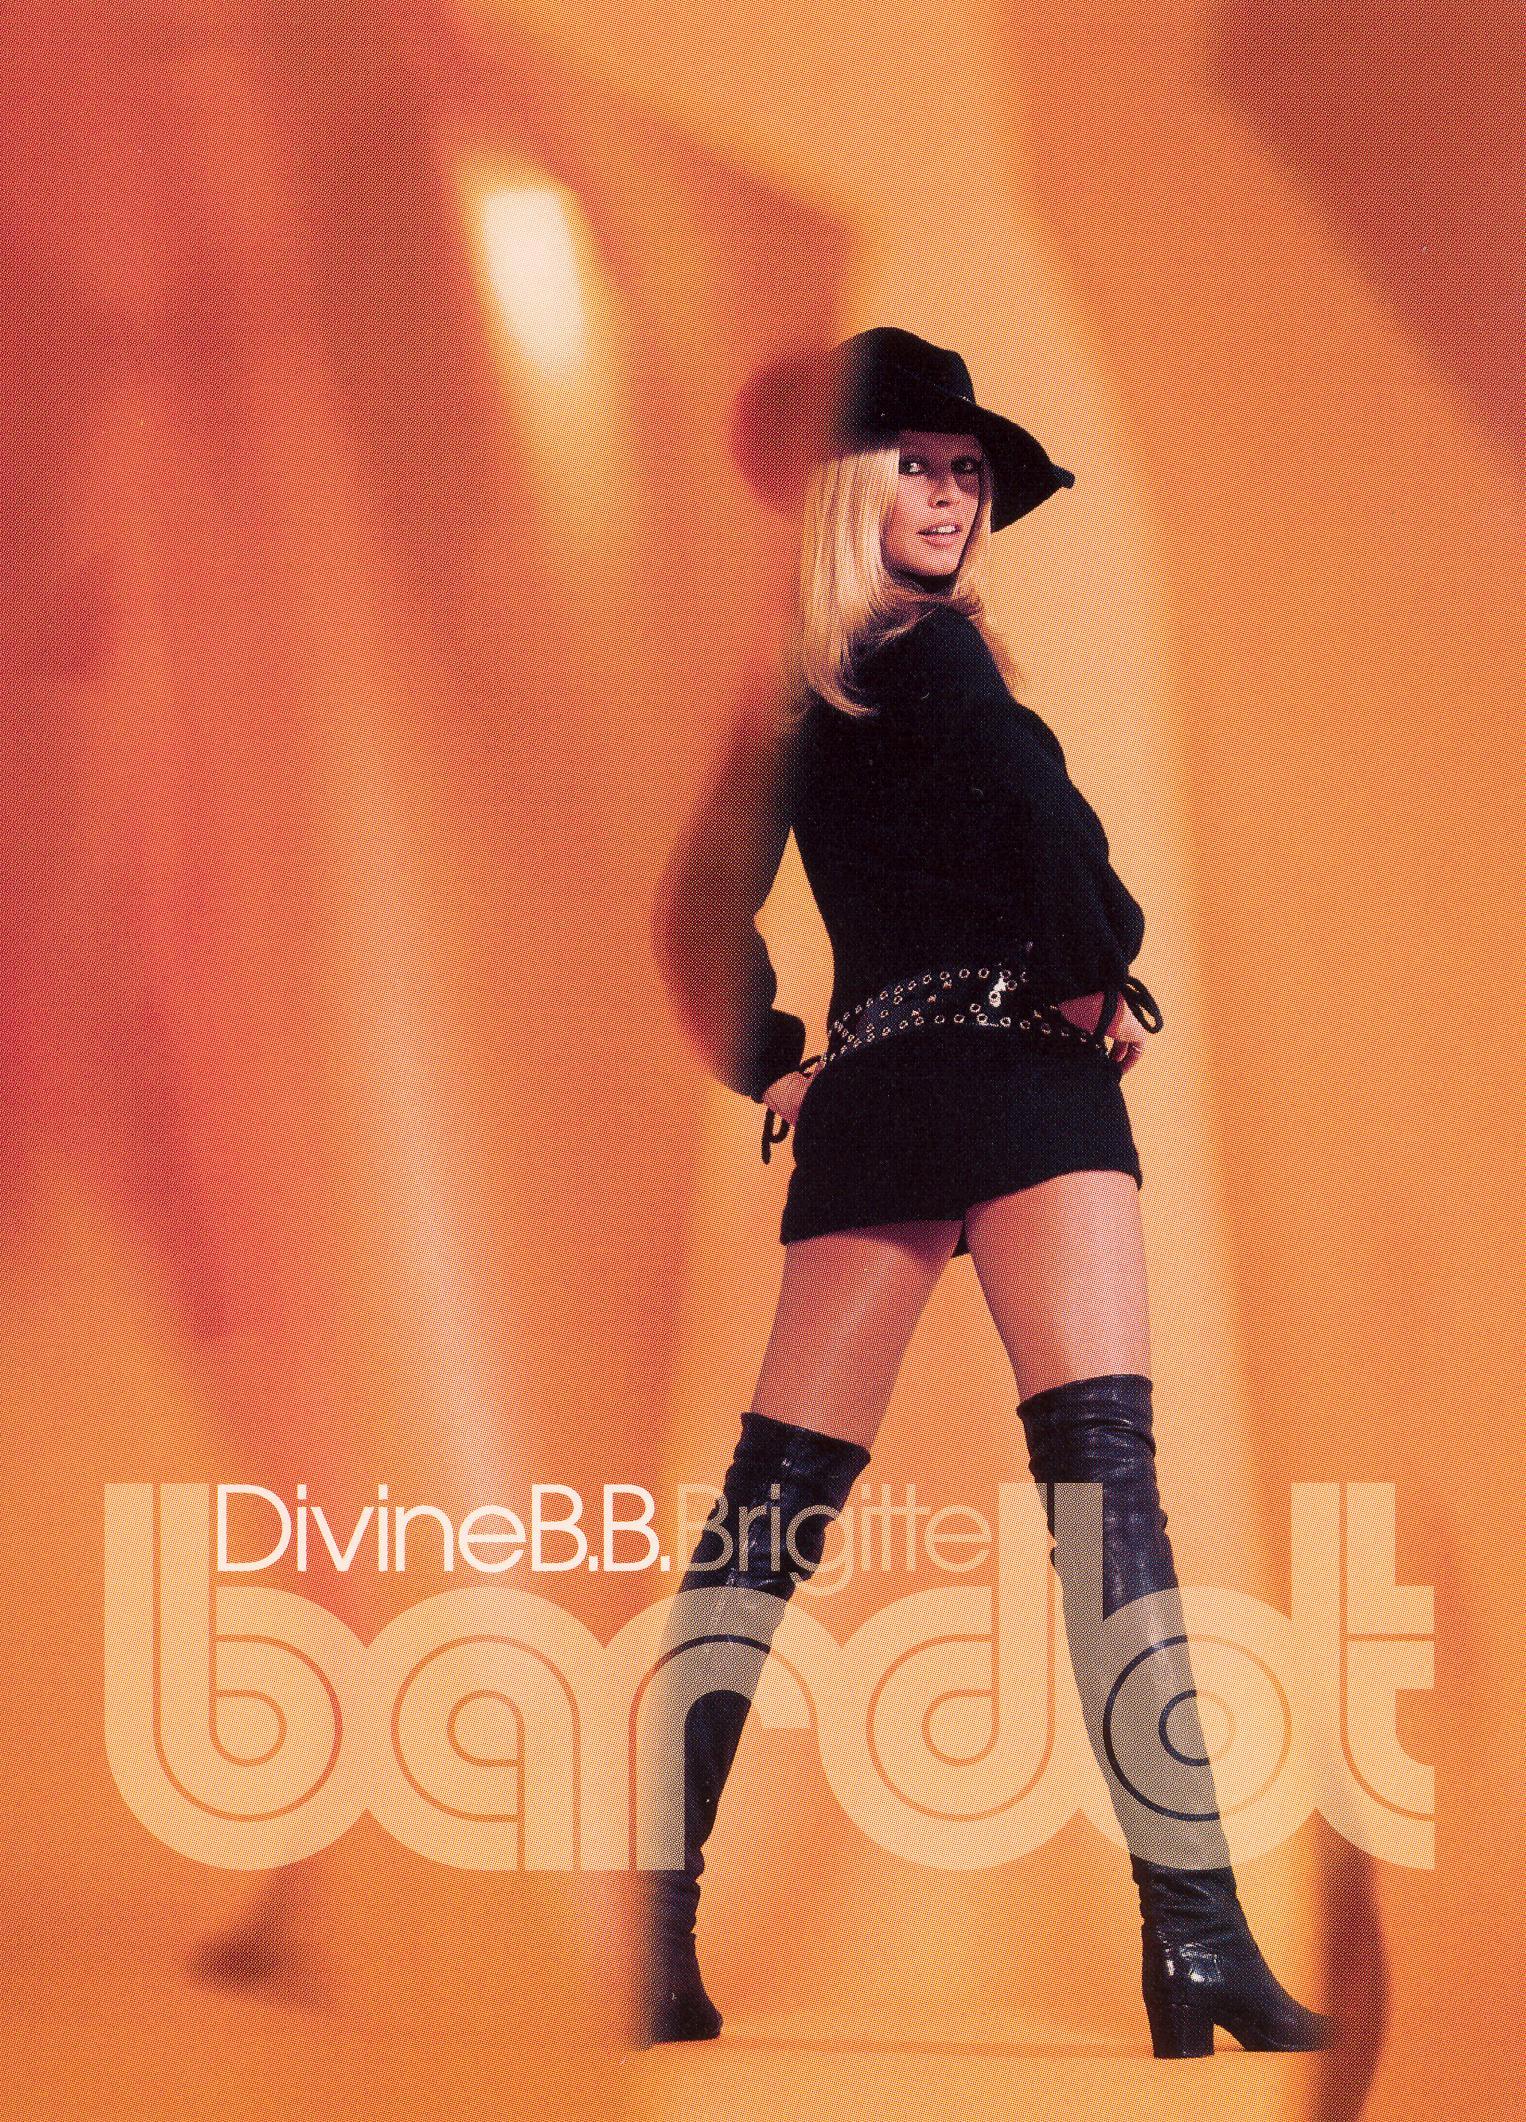 Brigitte Bardot: Divine BB